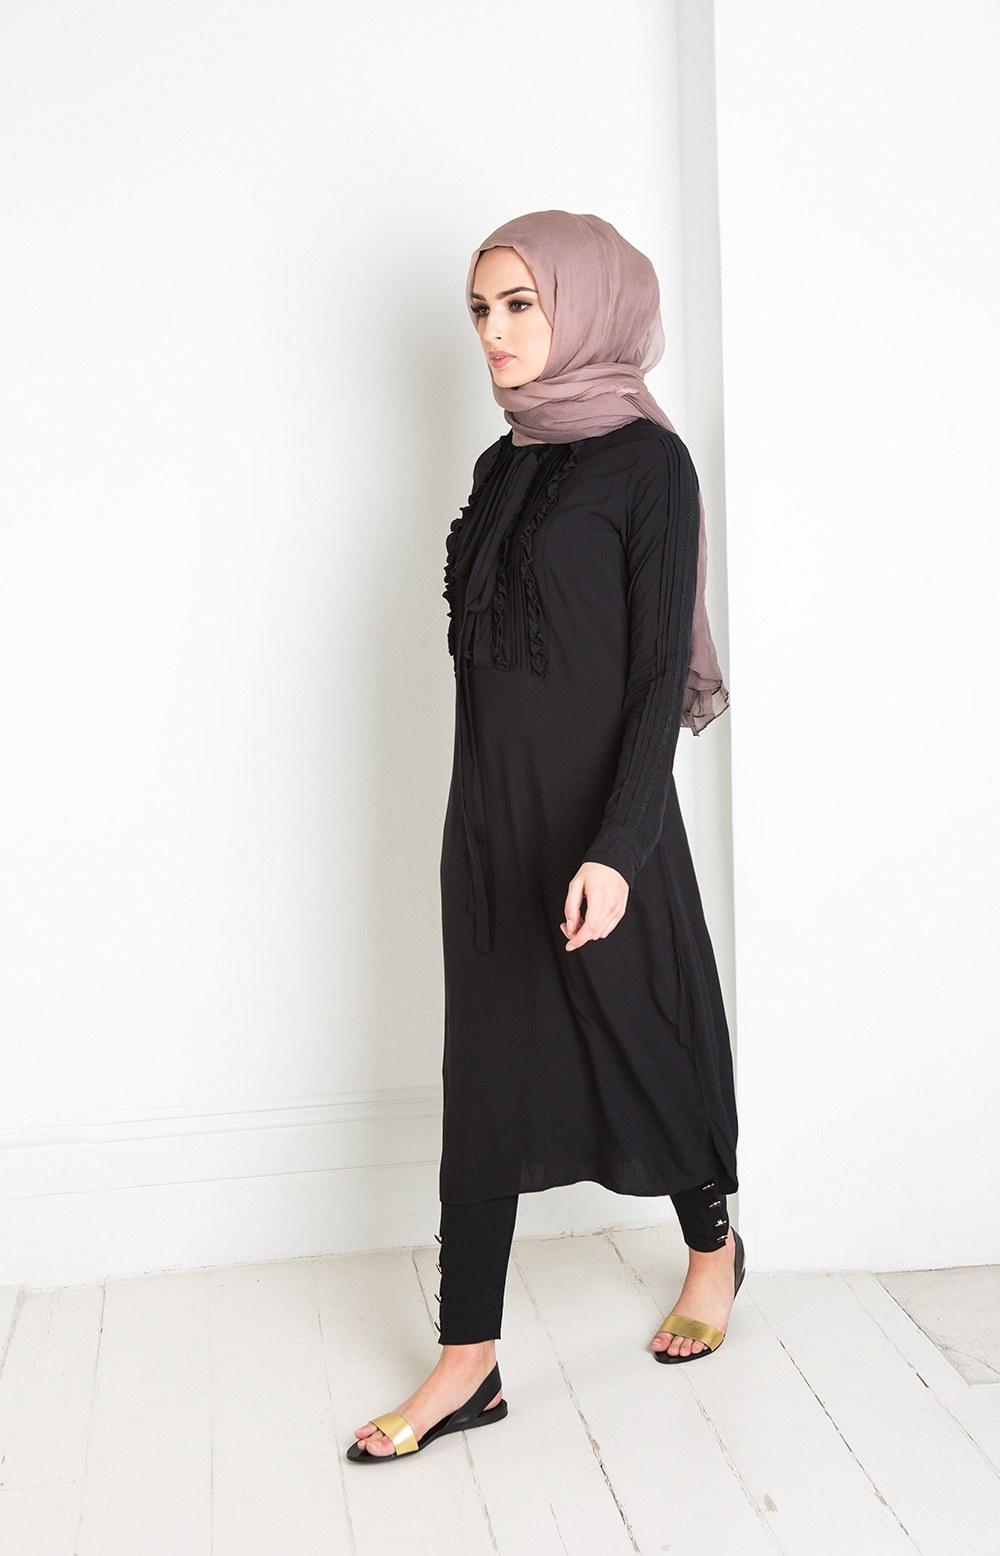 Design Model Baju Lebaran 2018 O2d5 25 Trend Model Baju Muslim Lebaran 2018 Simple & Modis